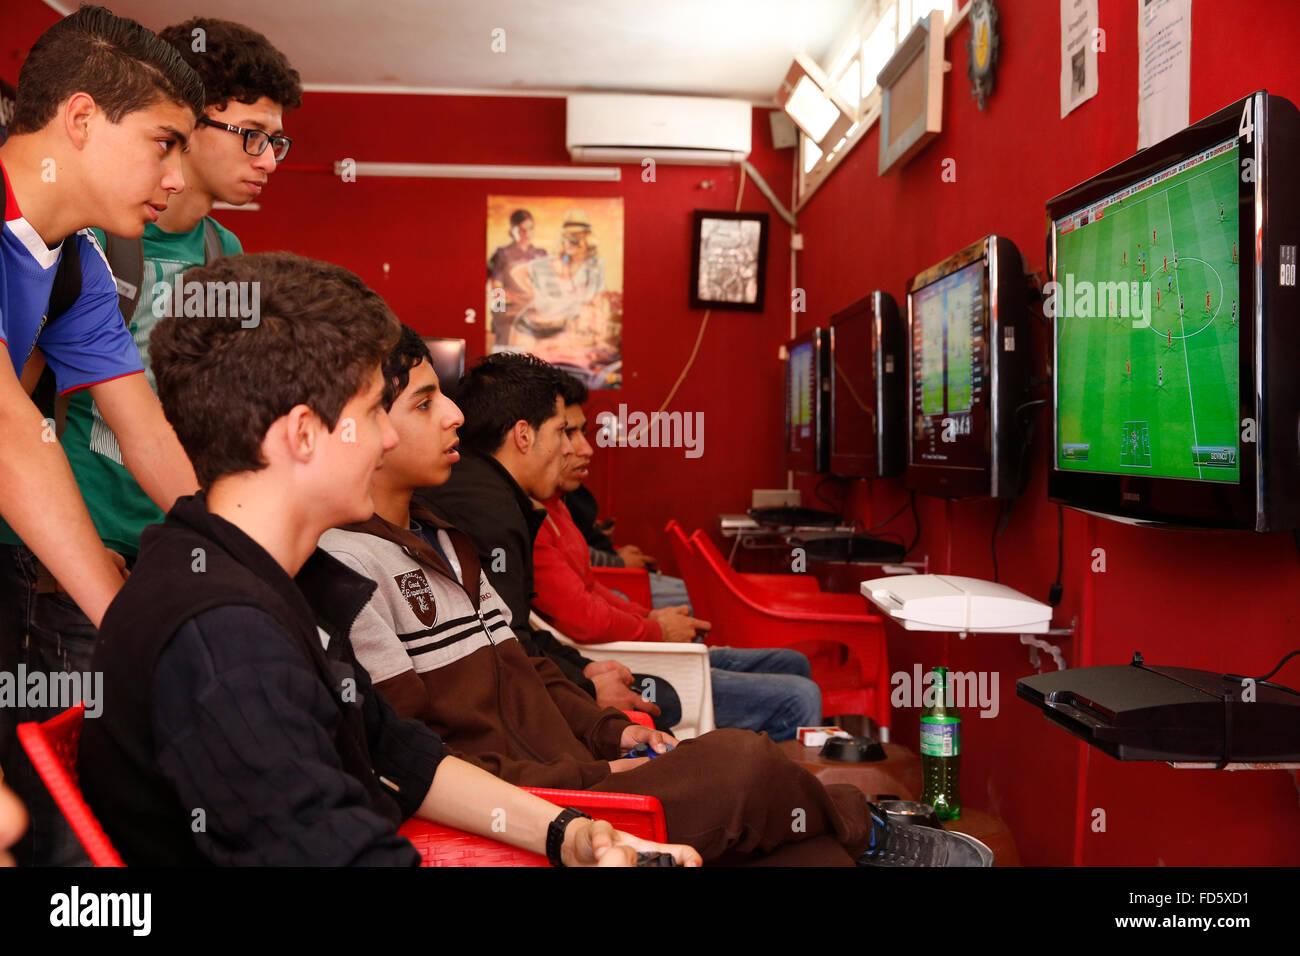 Salon de jeu vidéo à La Marsa, Tunisie. Photo Stock